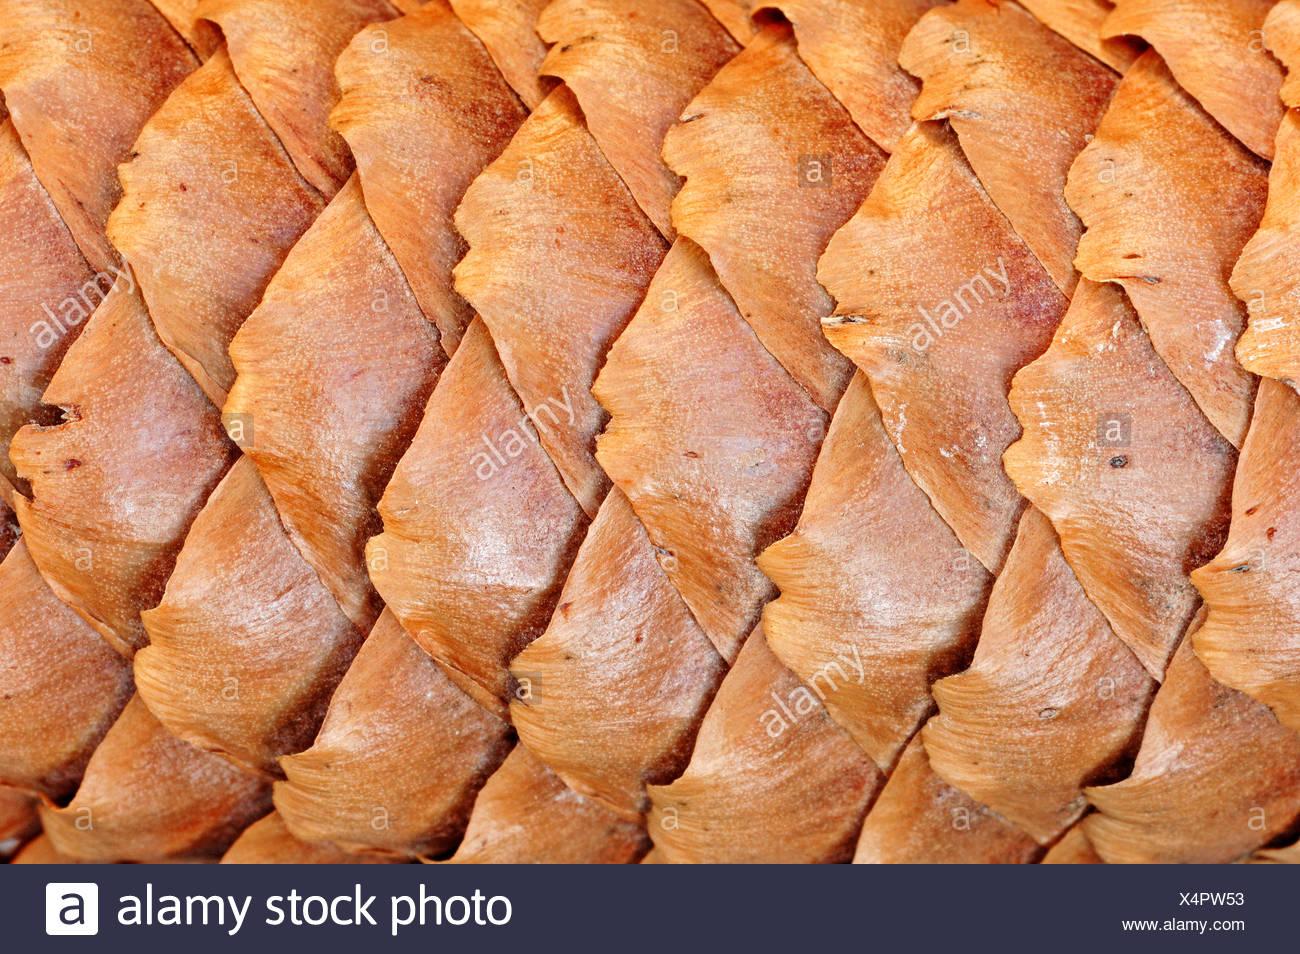 Norway Spruce, cone, North Rhine-Westphalia, Germany / (Picea abies) - Stock Image